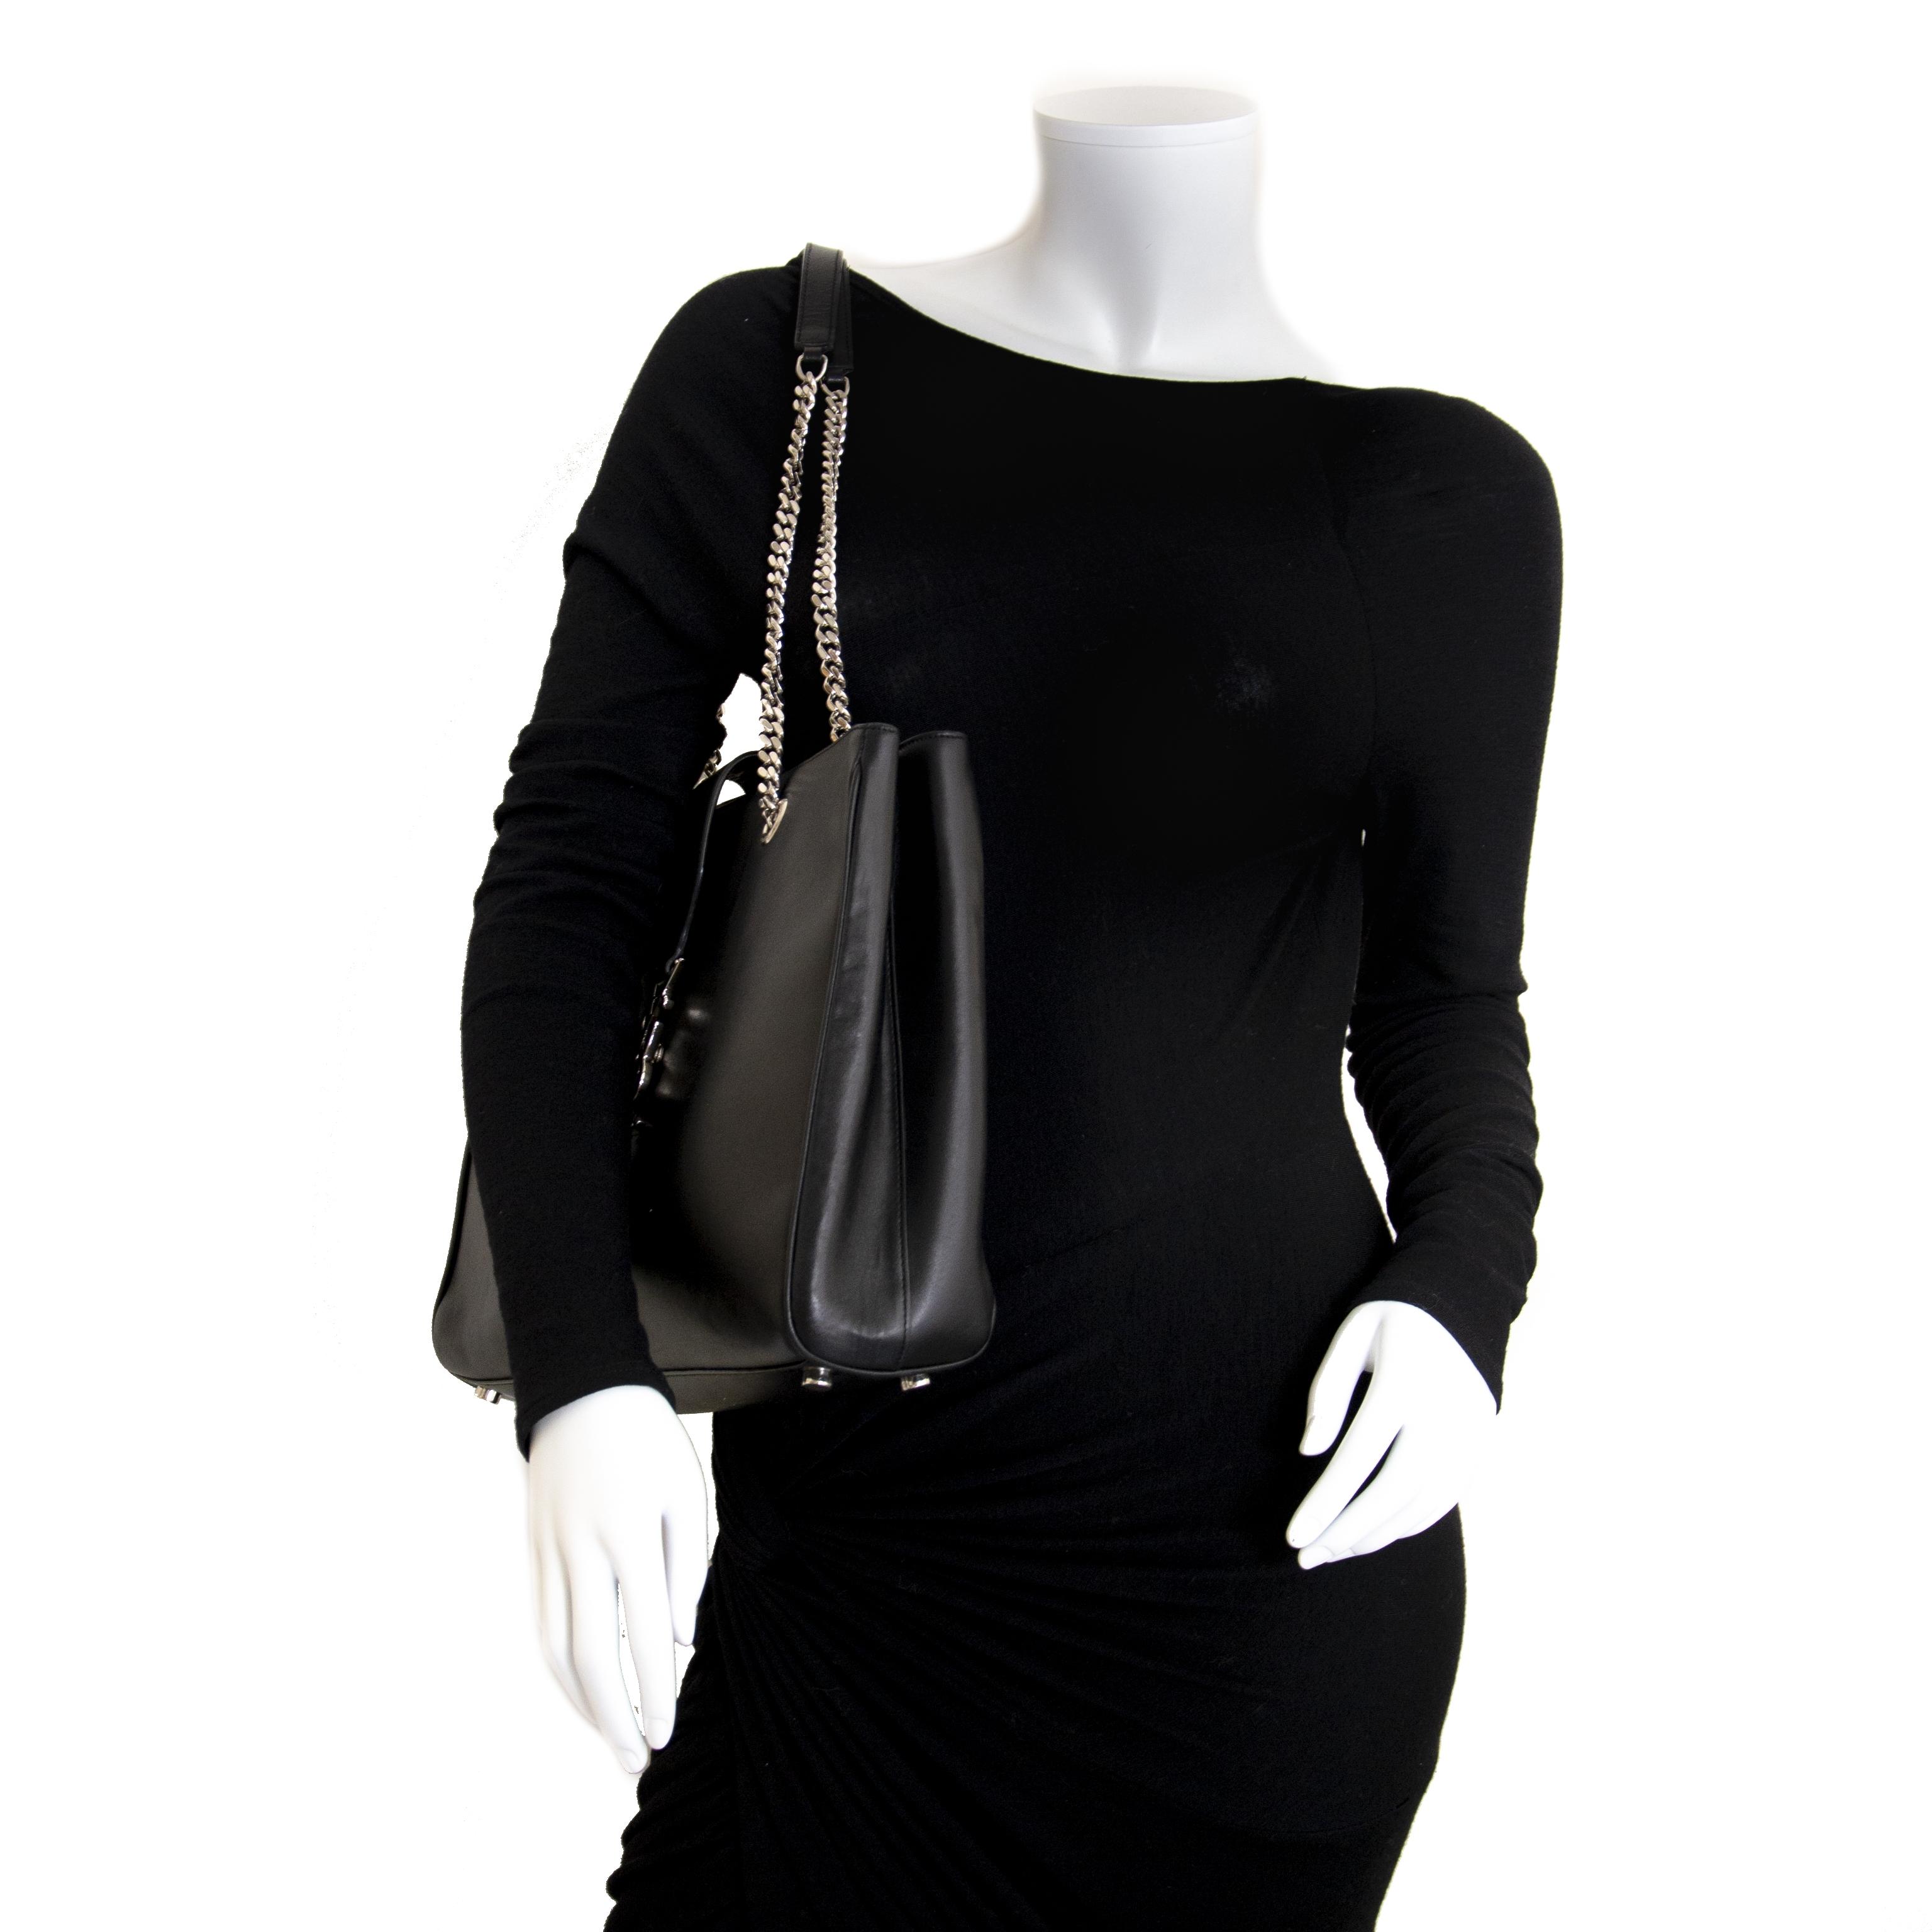 Saint Laurent Classic Monogram Shopping Bag for sale online at Labellov